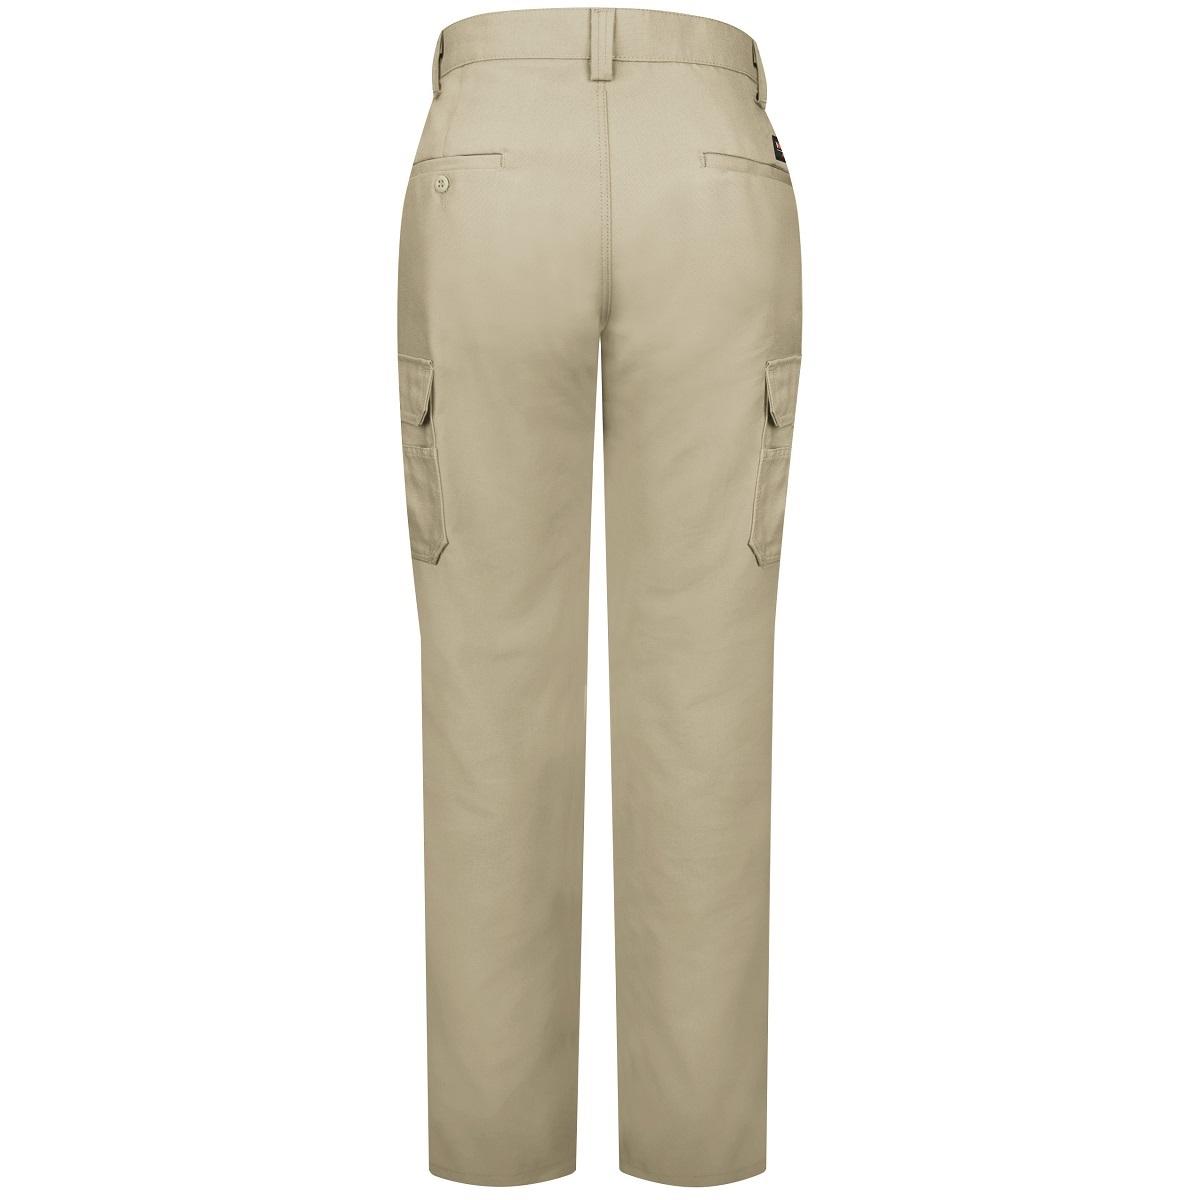 Popular Khakis Pants For Women Old Navy Khaki Work Pants Women